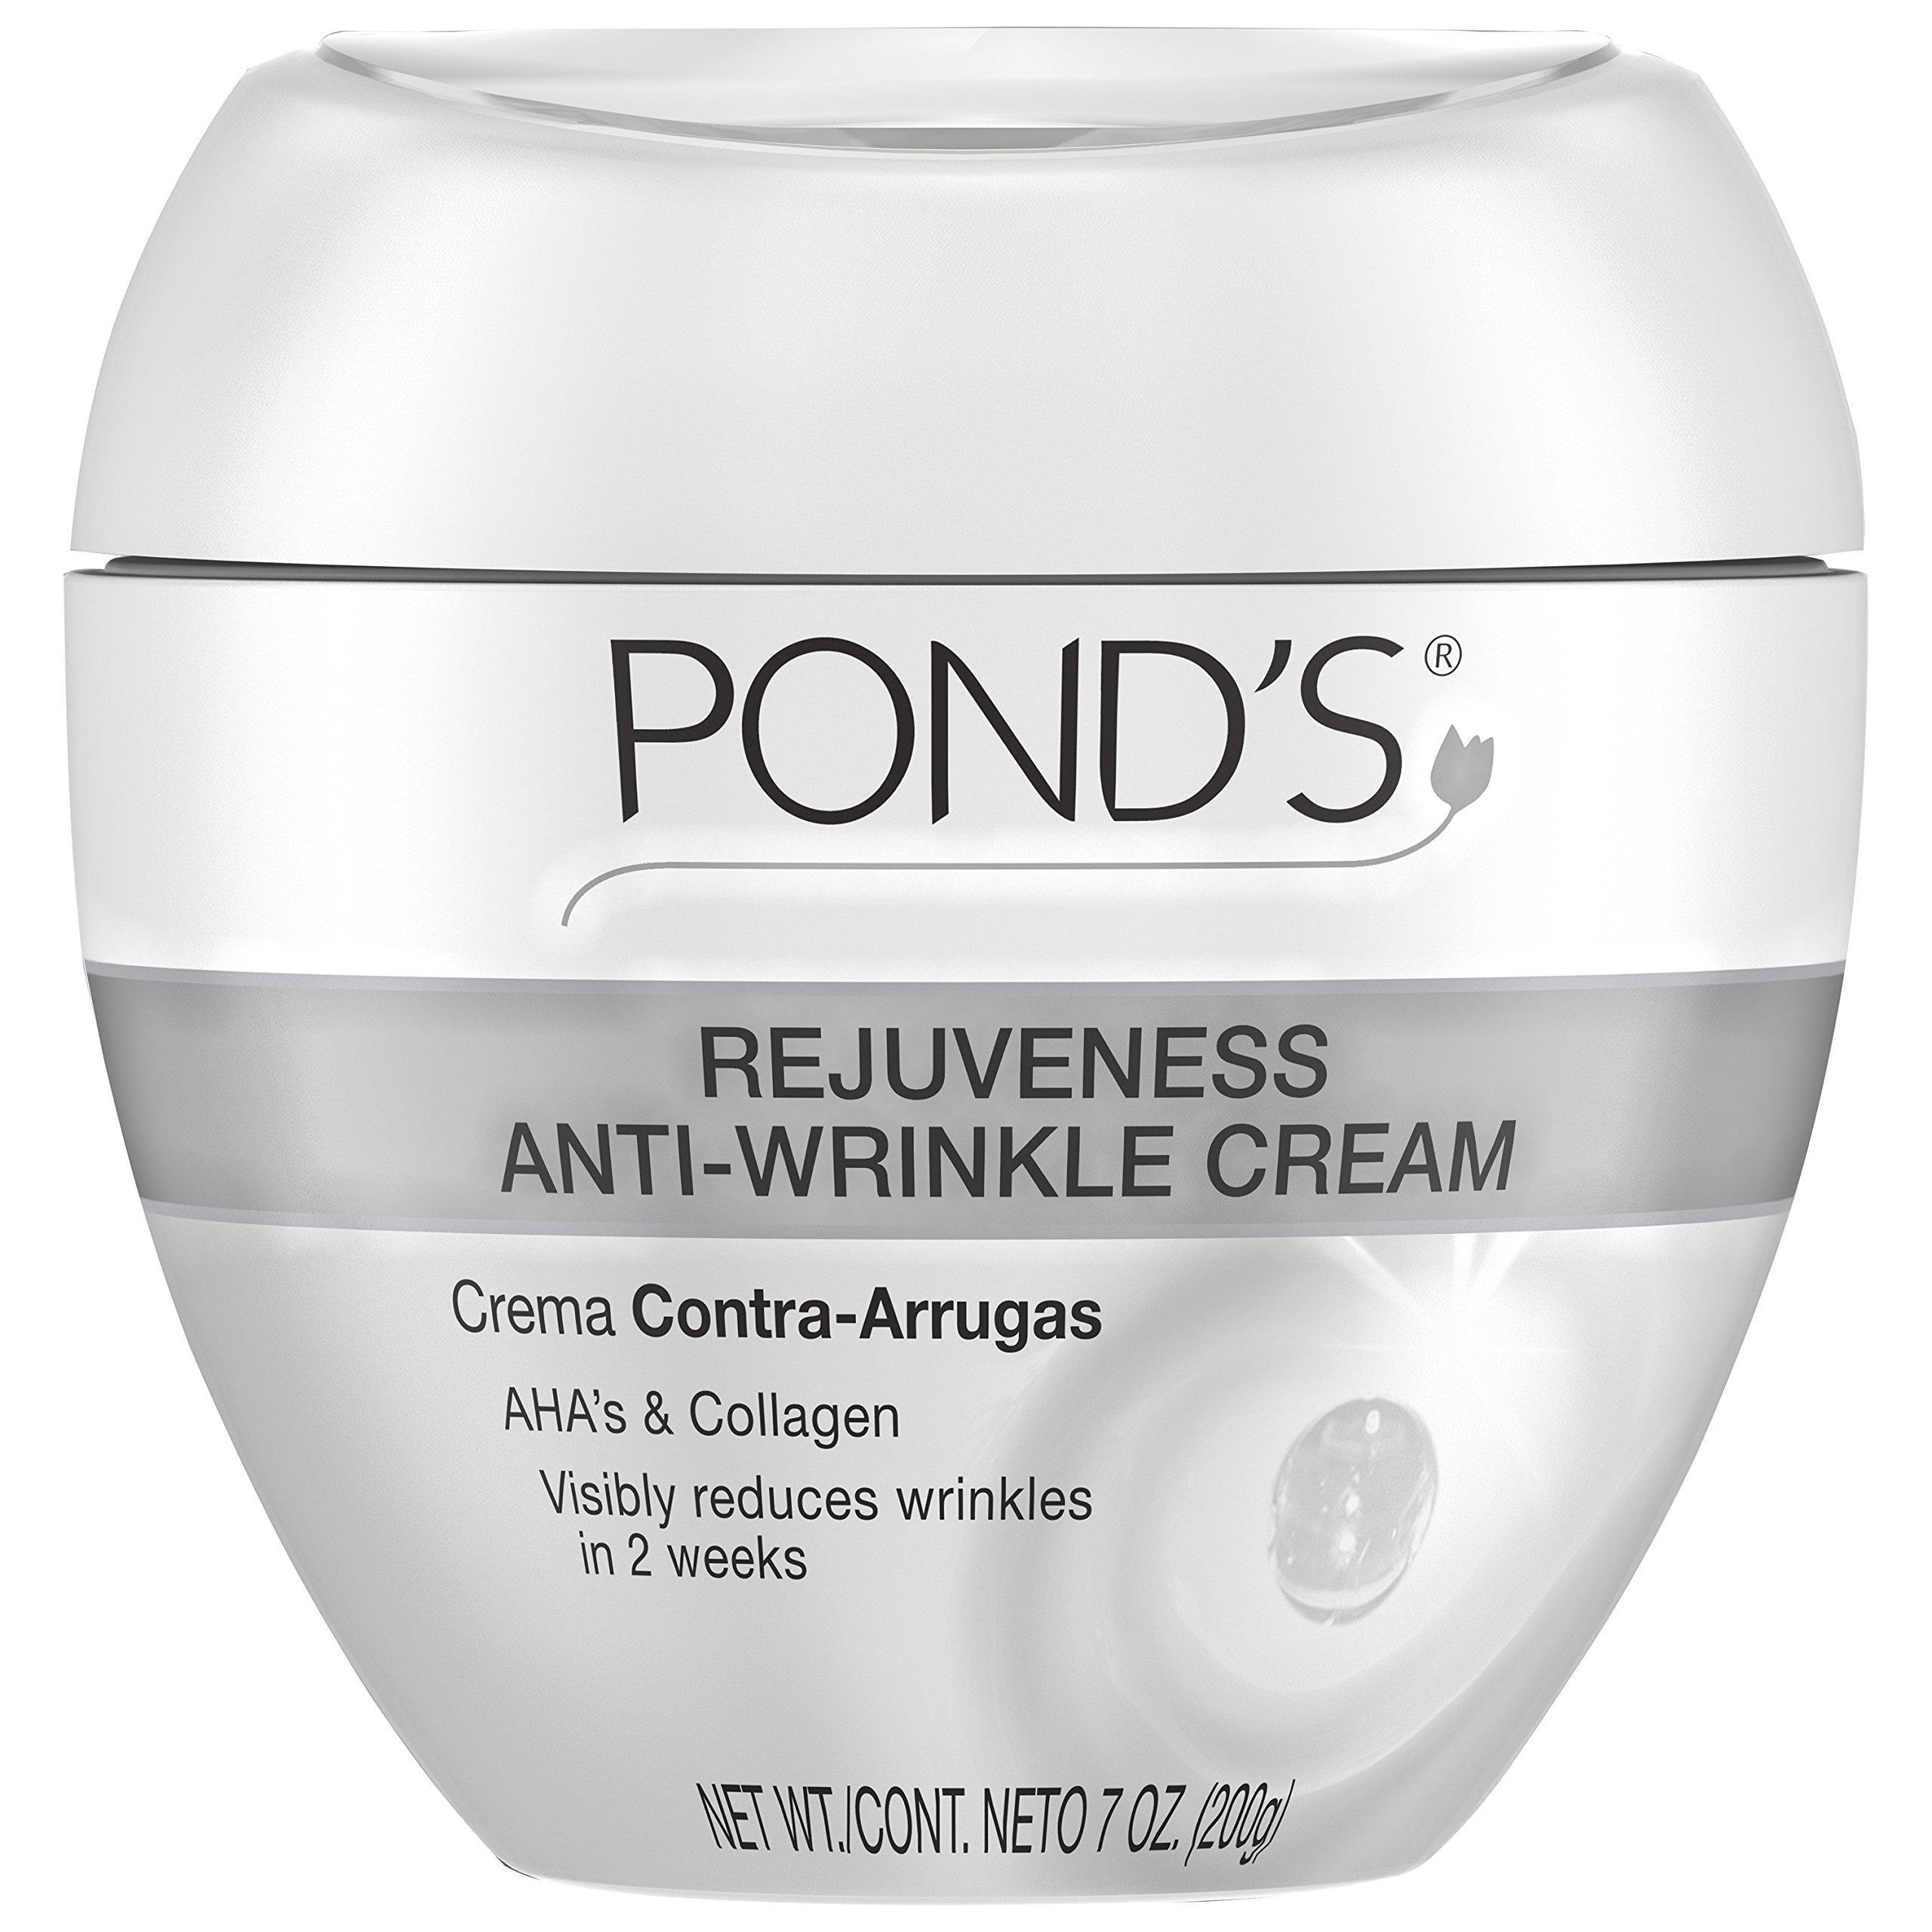 Unilever Pond's Rejuveness Anti-wrinkle Cream - 7 Oz